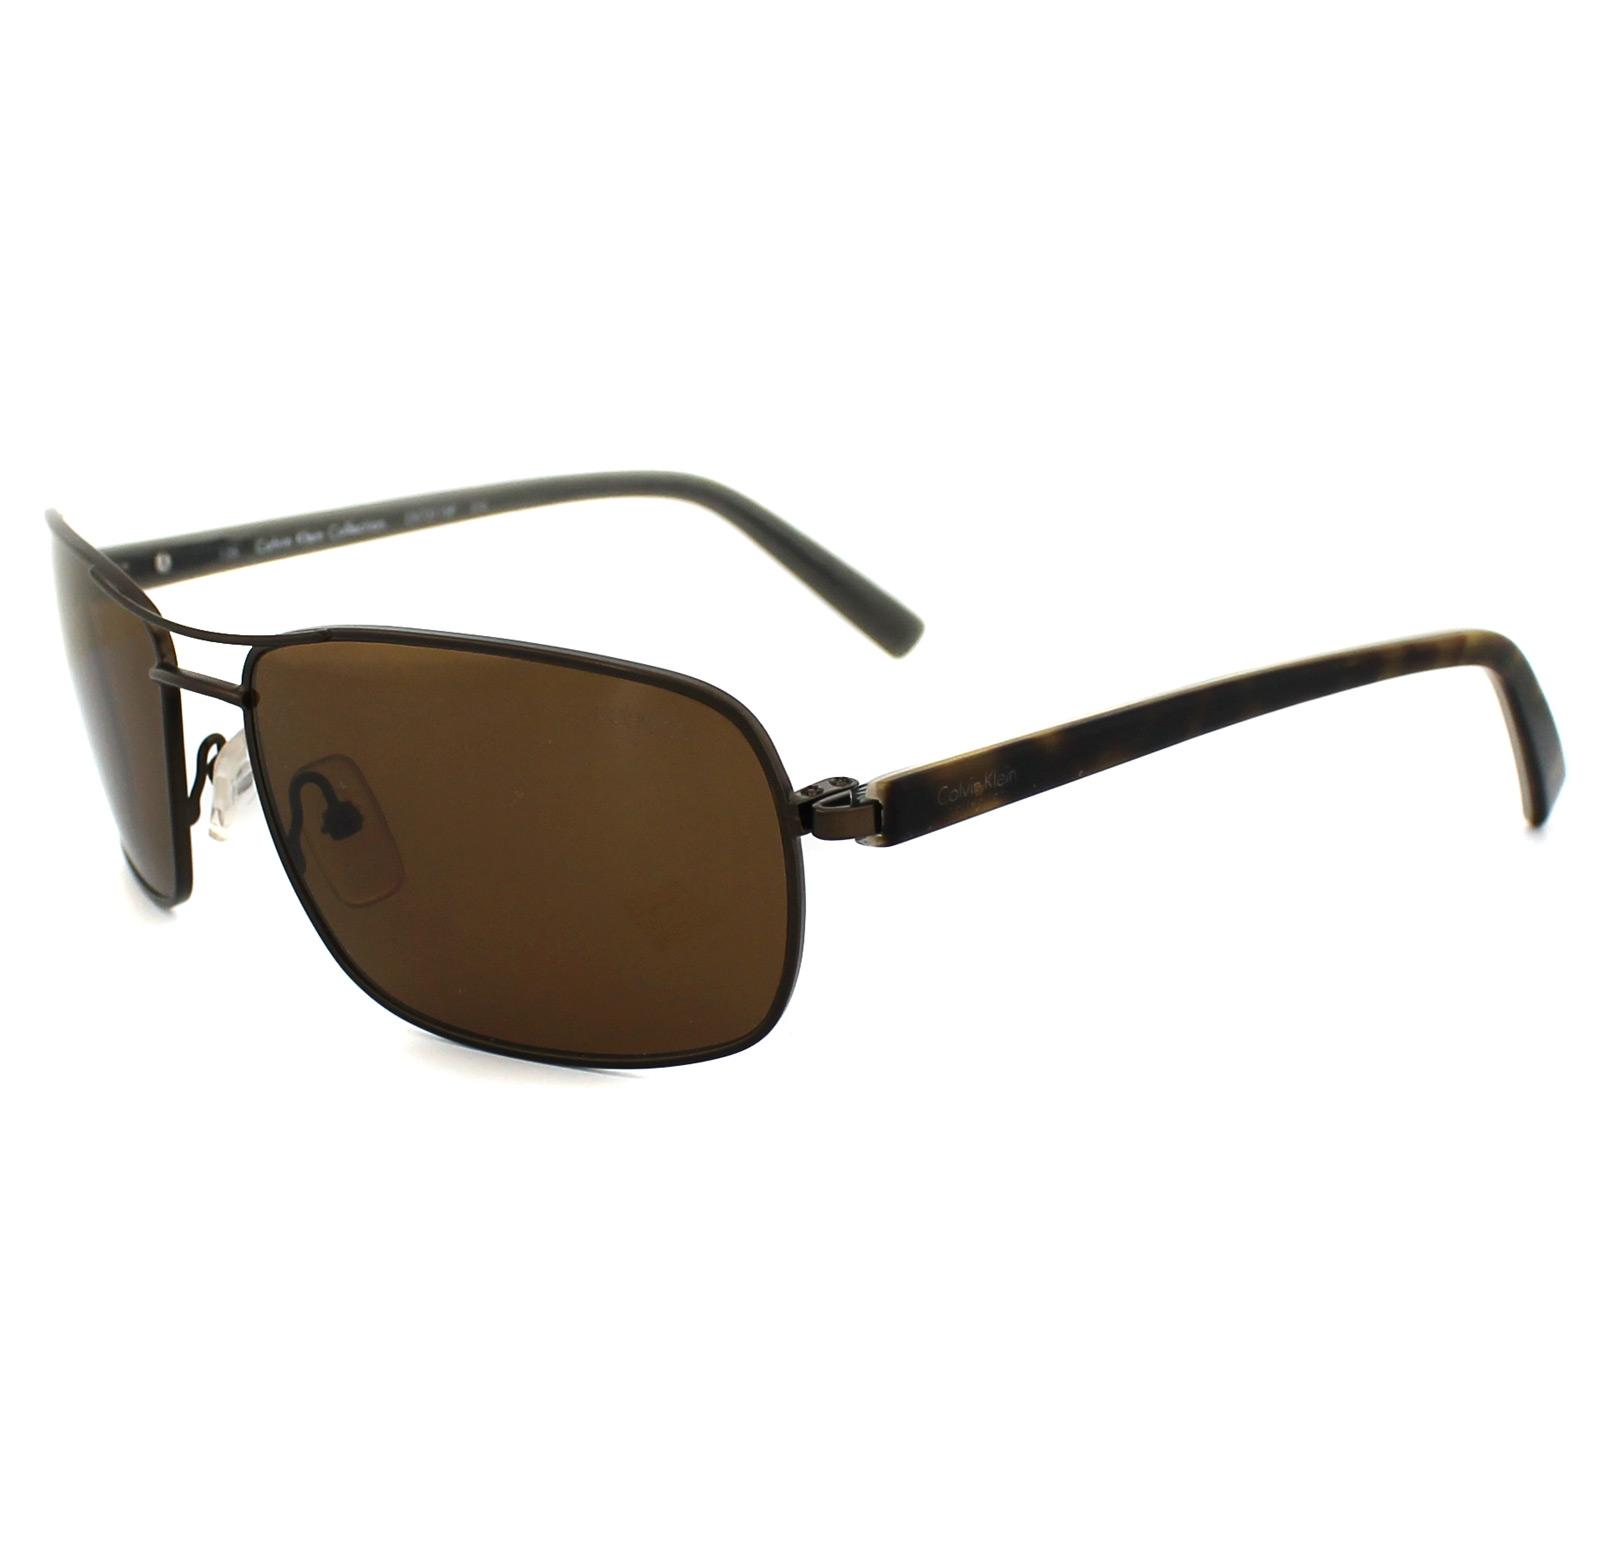 8df483188e9 Sentinel Calvin Klein Sunglasses 7311SP 210 Brown   Havana Brown Polarized